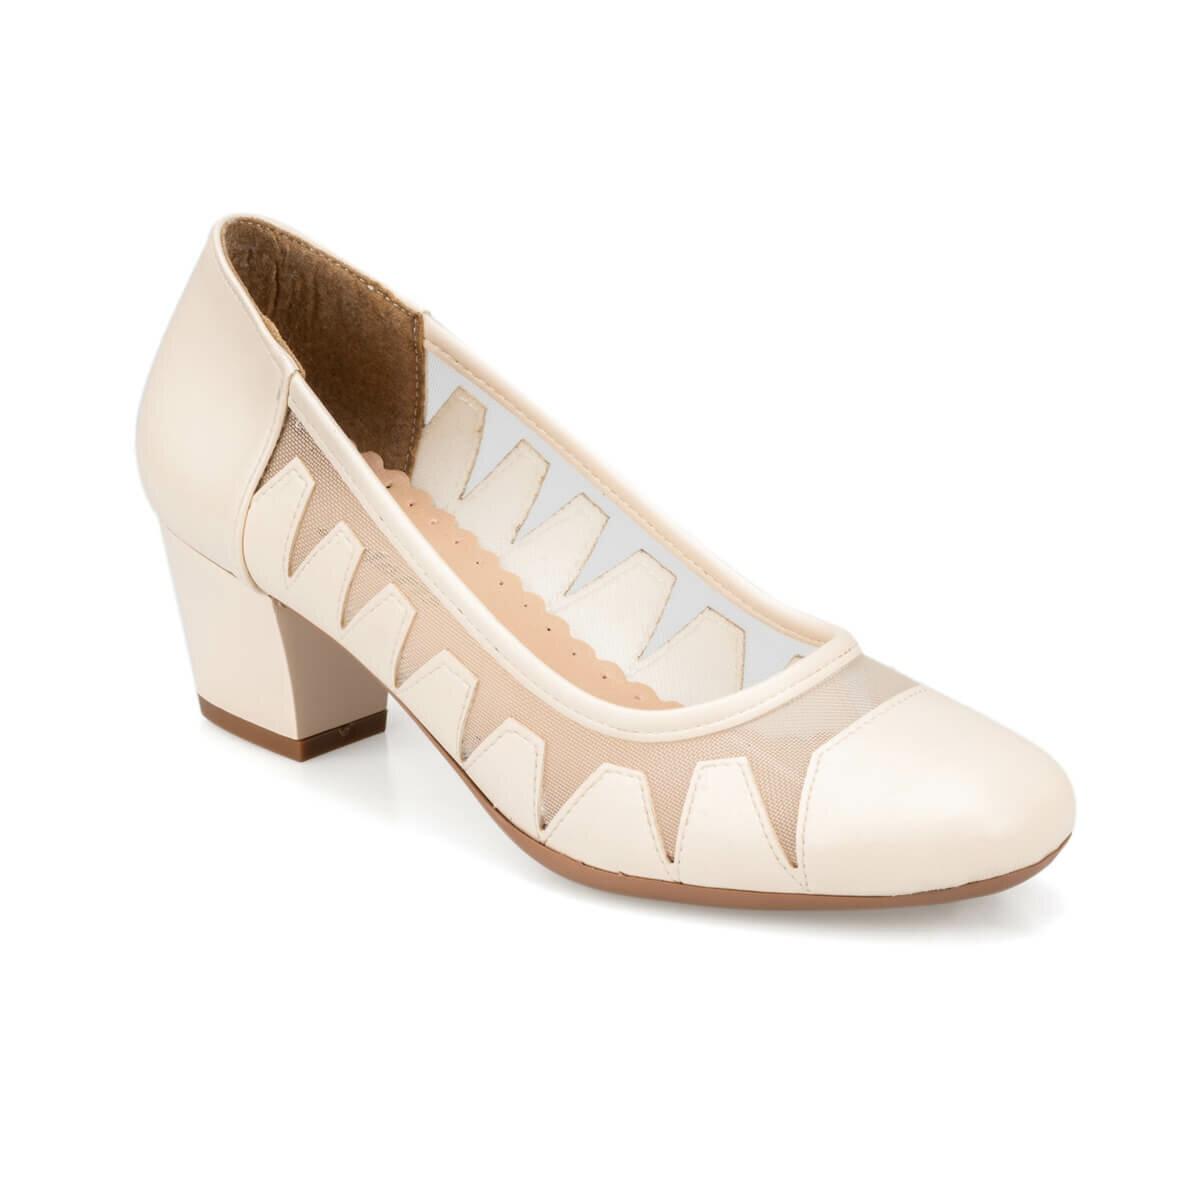 FLO 91.311171.Z Beige Women Gova Shoes Polaris